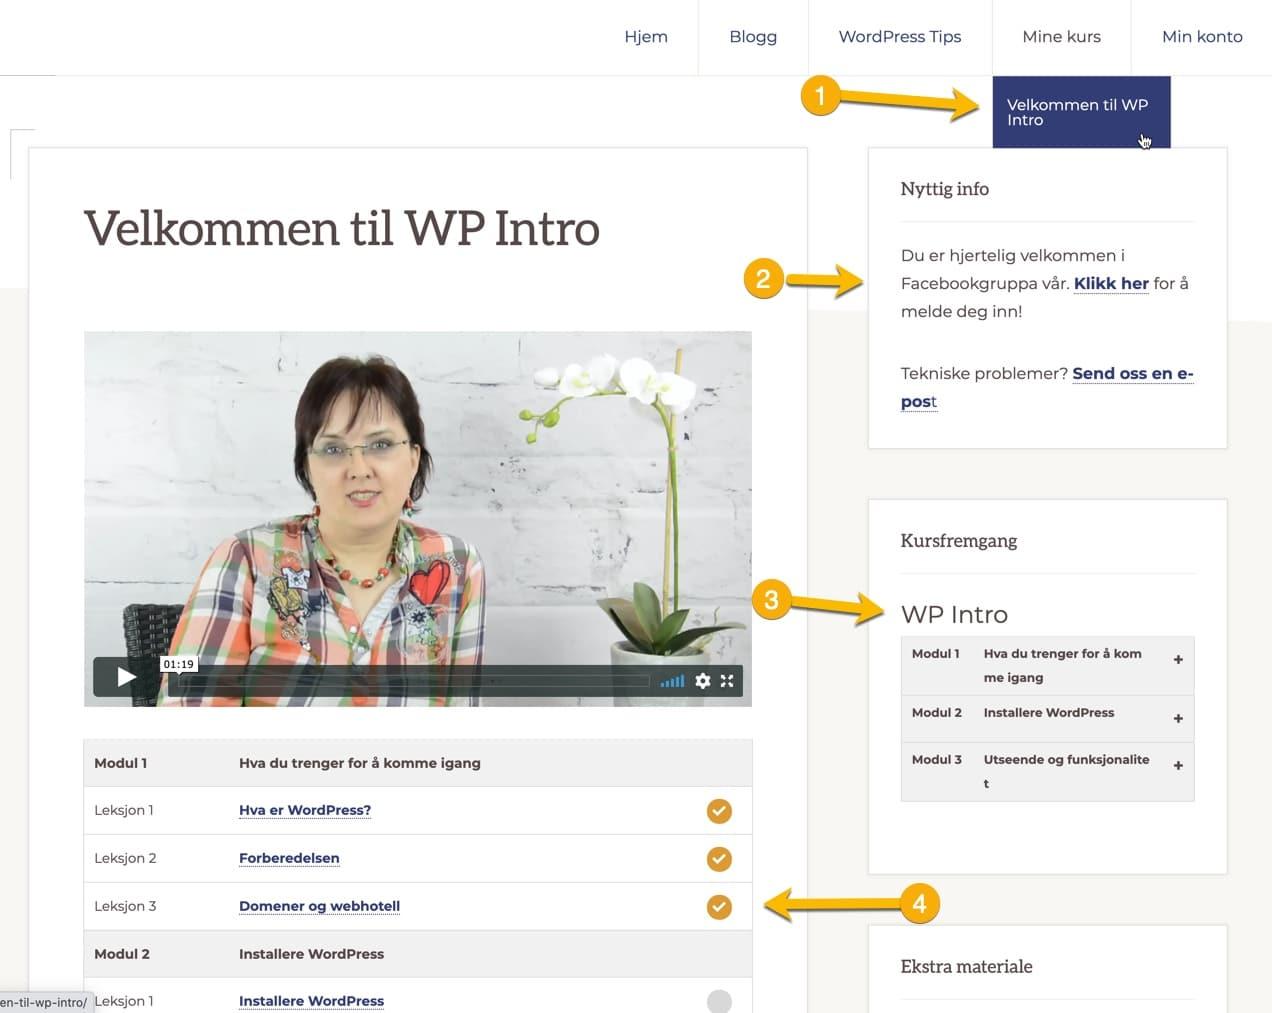 Hvordan fungerer medlemsportal i WordPress?